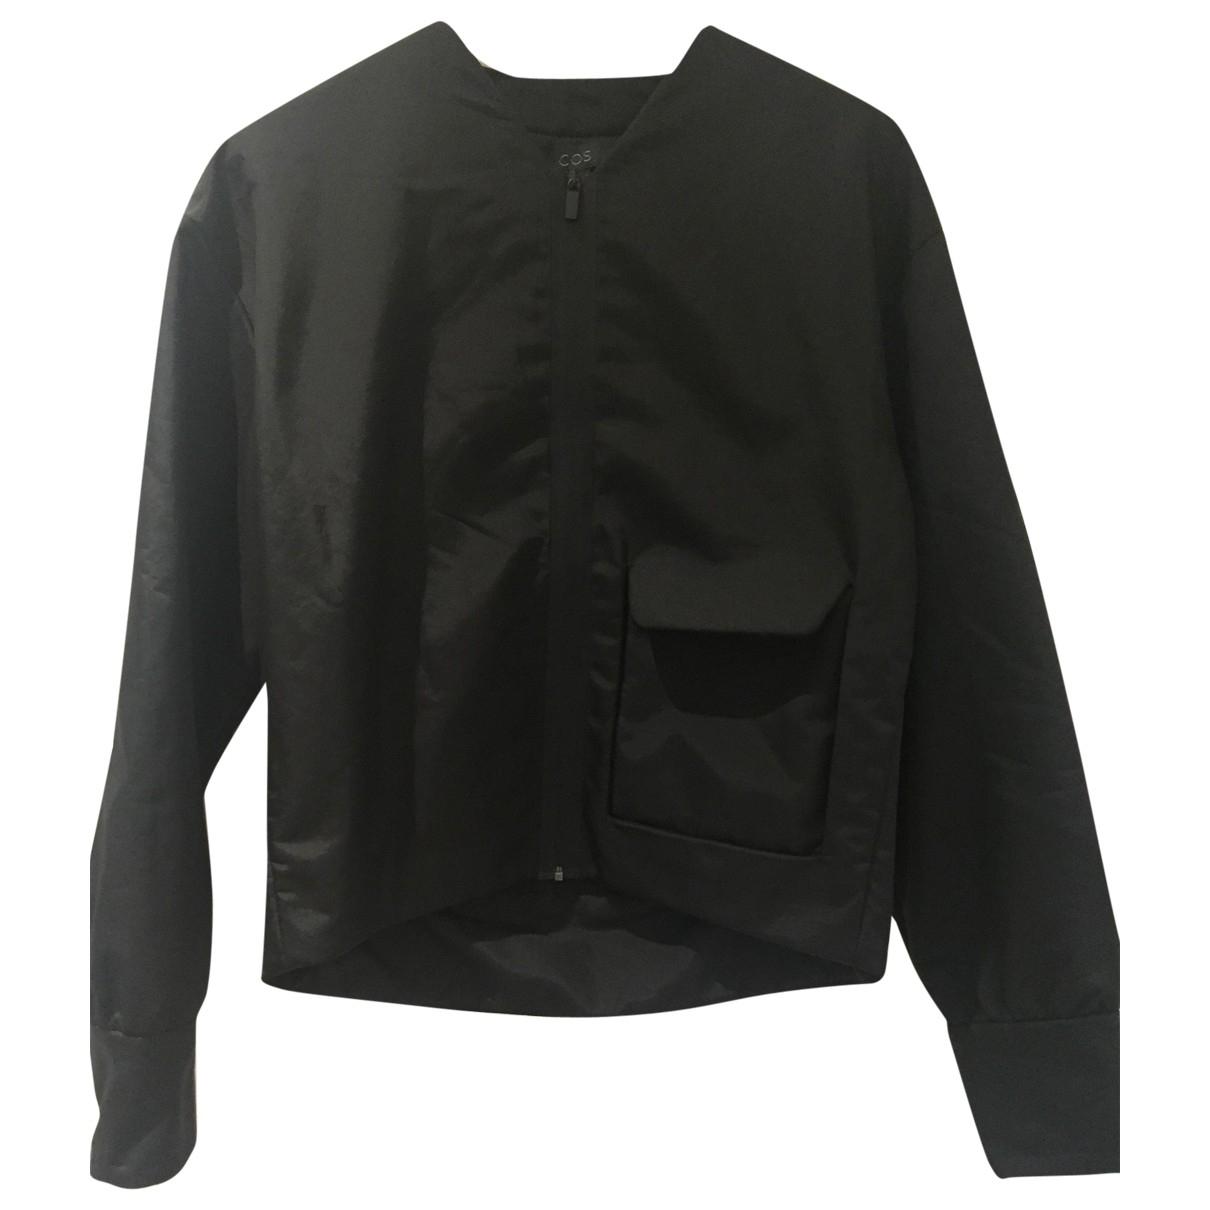 Cos \N Black jacket for Women 8 UK